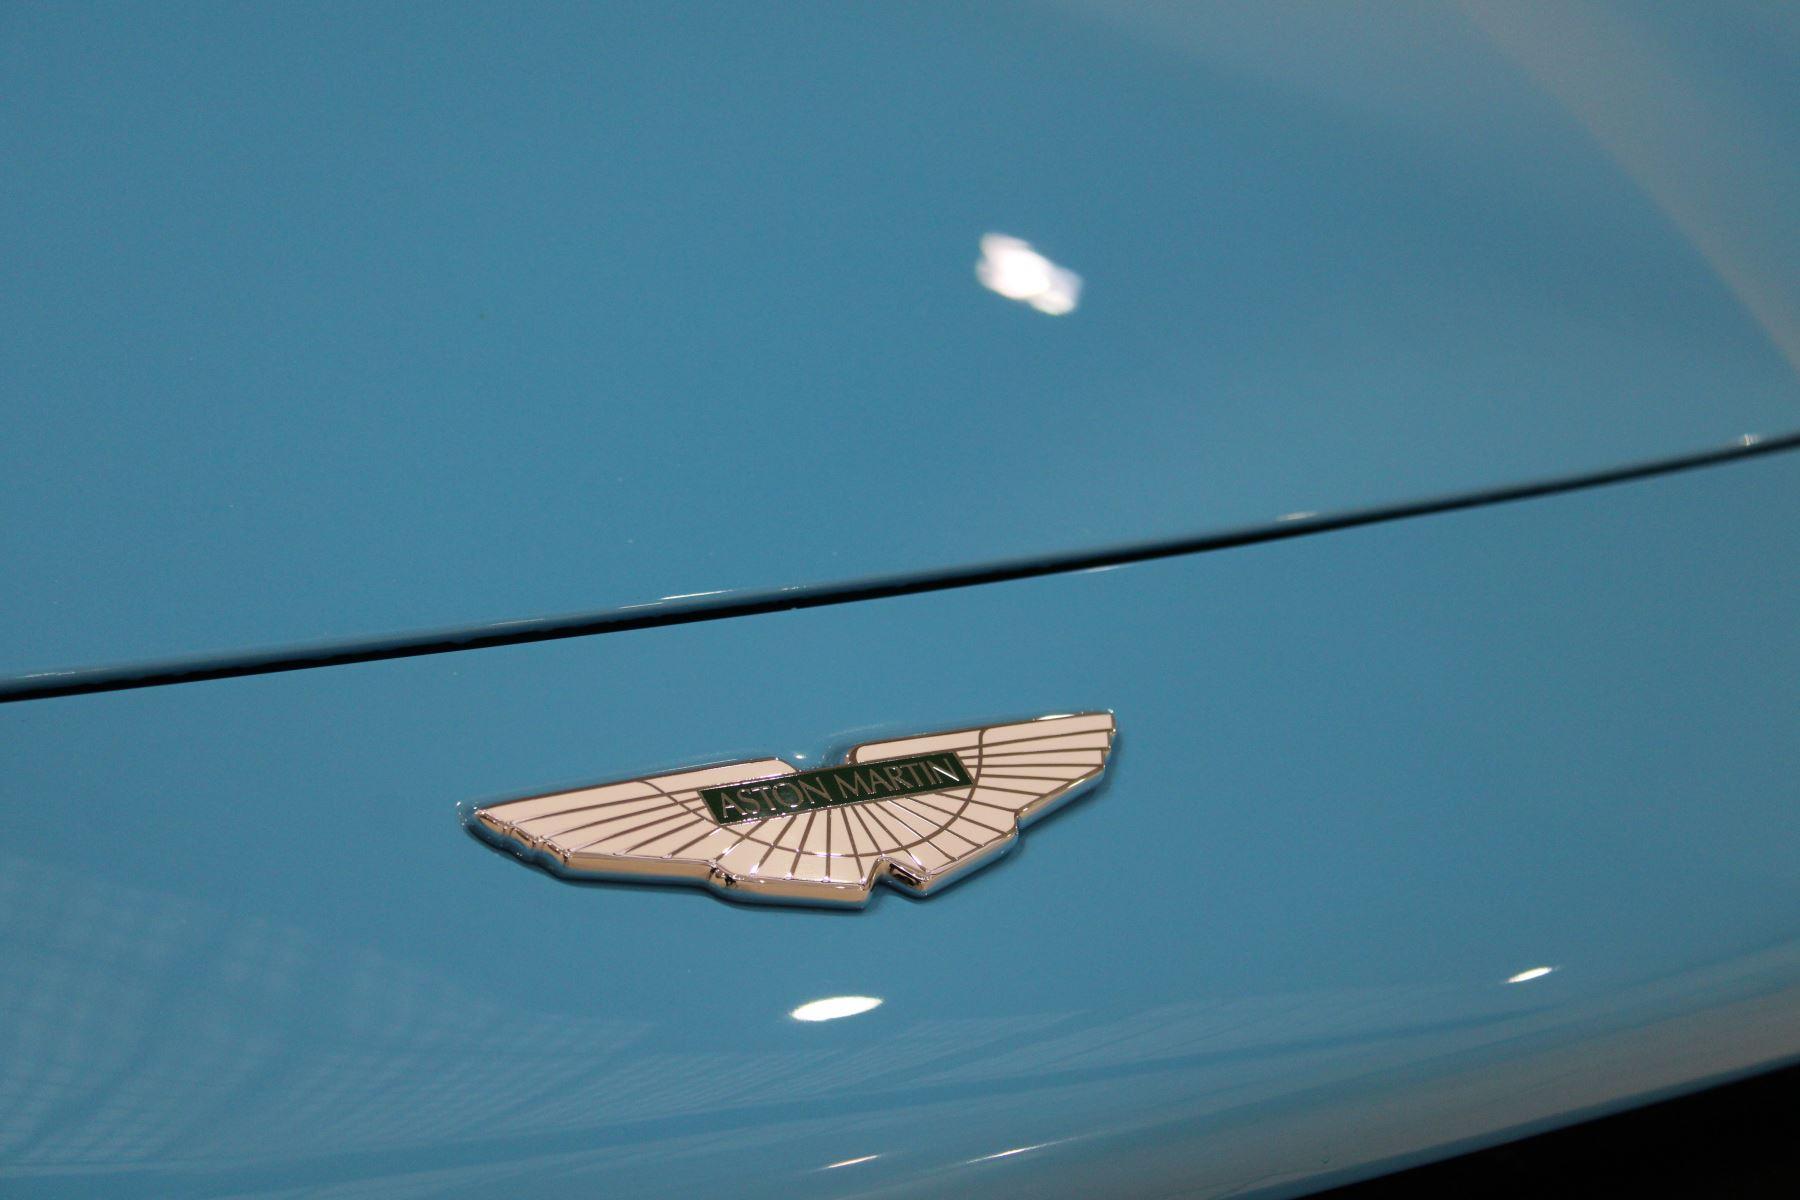 Aston Martin New Vantage 2dr image 12